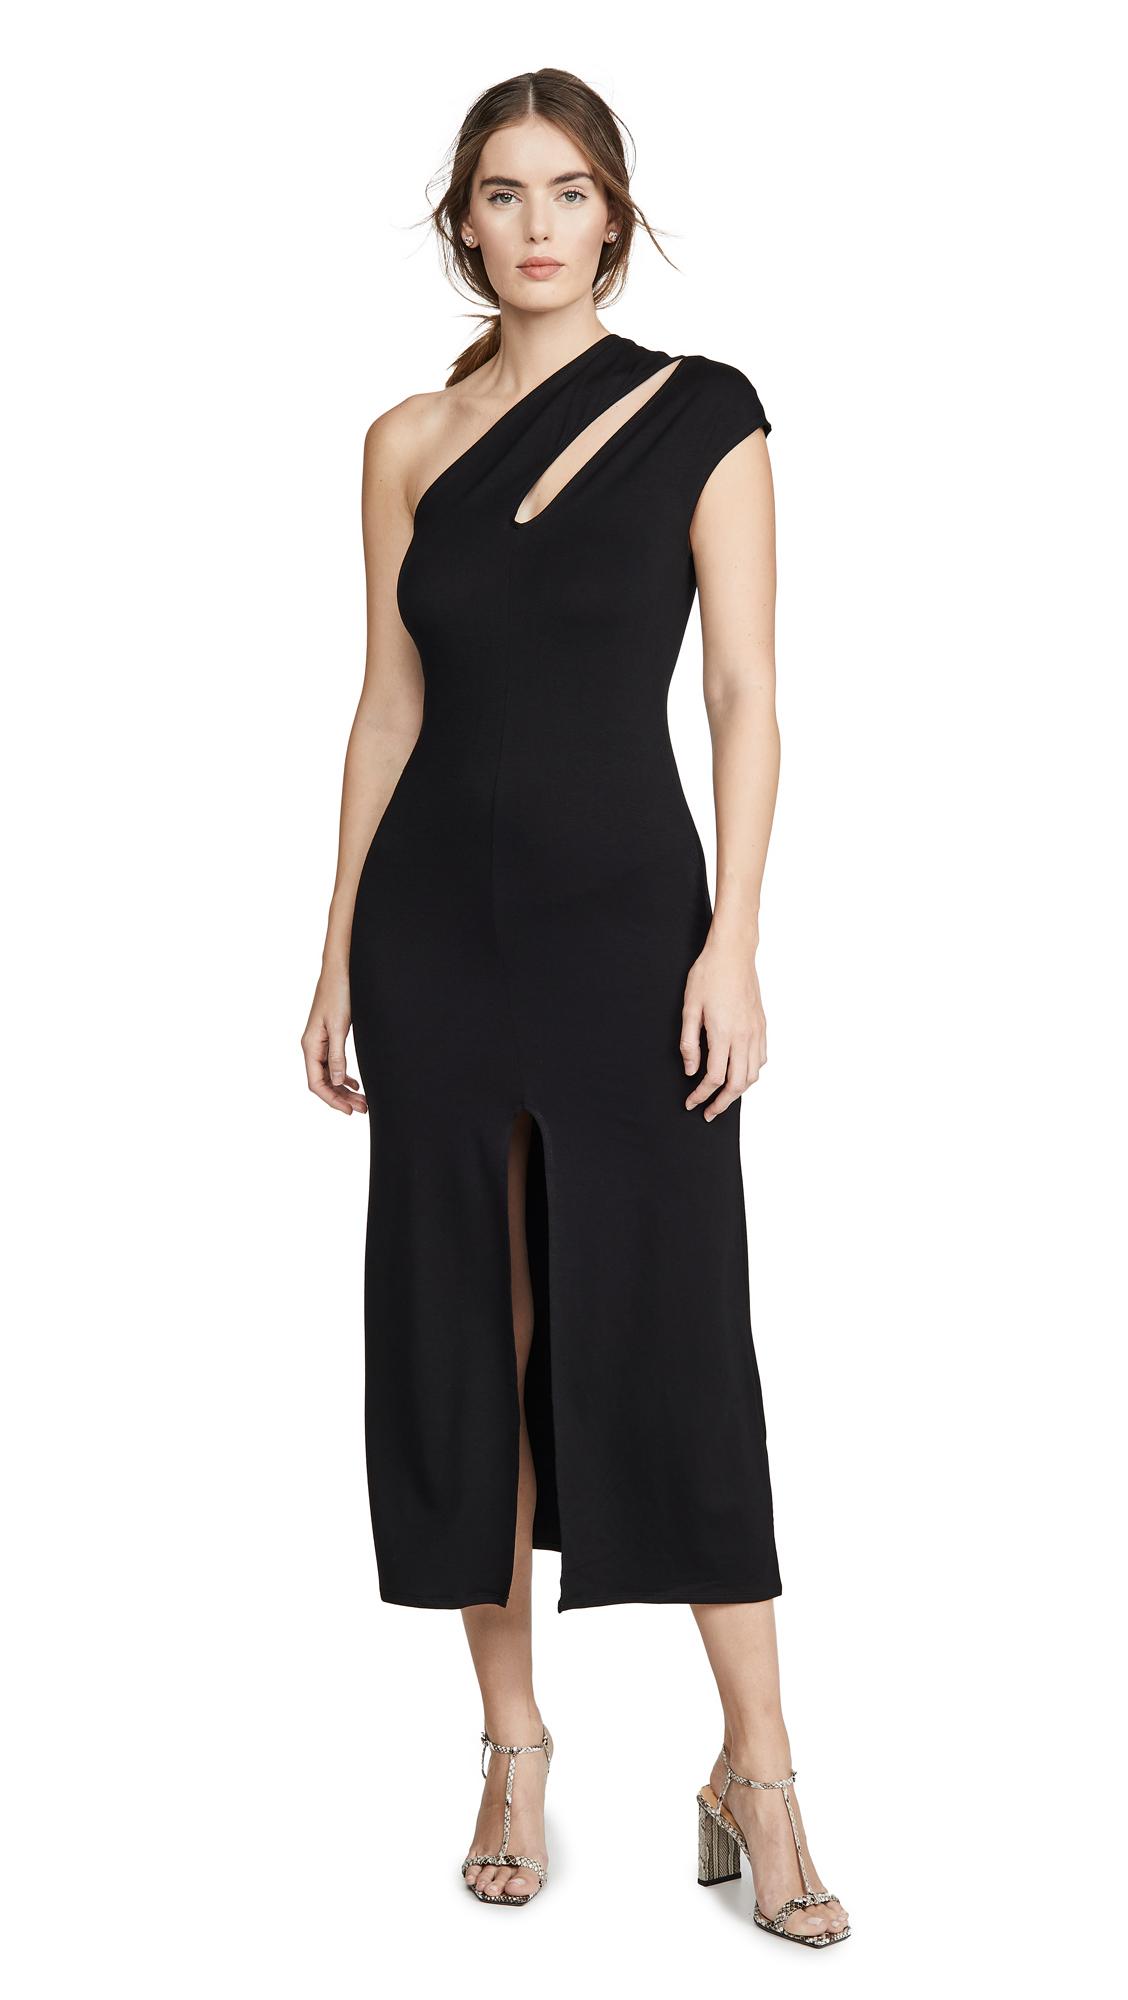 Photo of Reformation Saravia Dress - shop Reformation Clothing, Dresses online